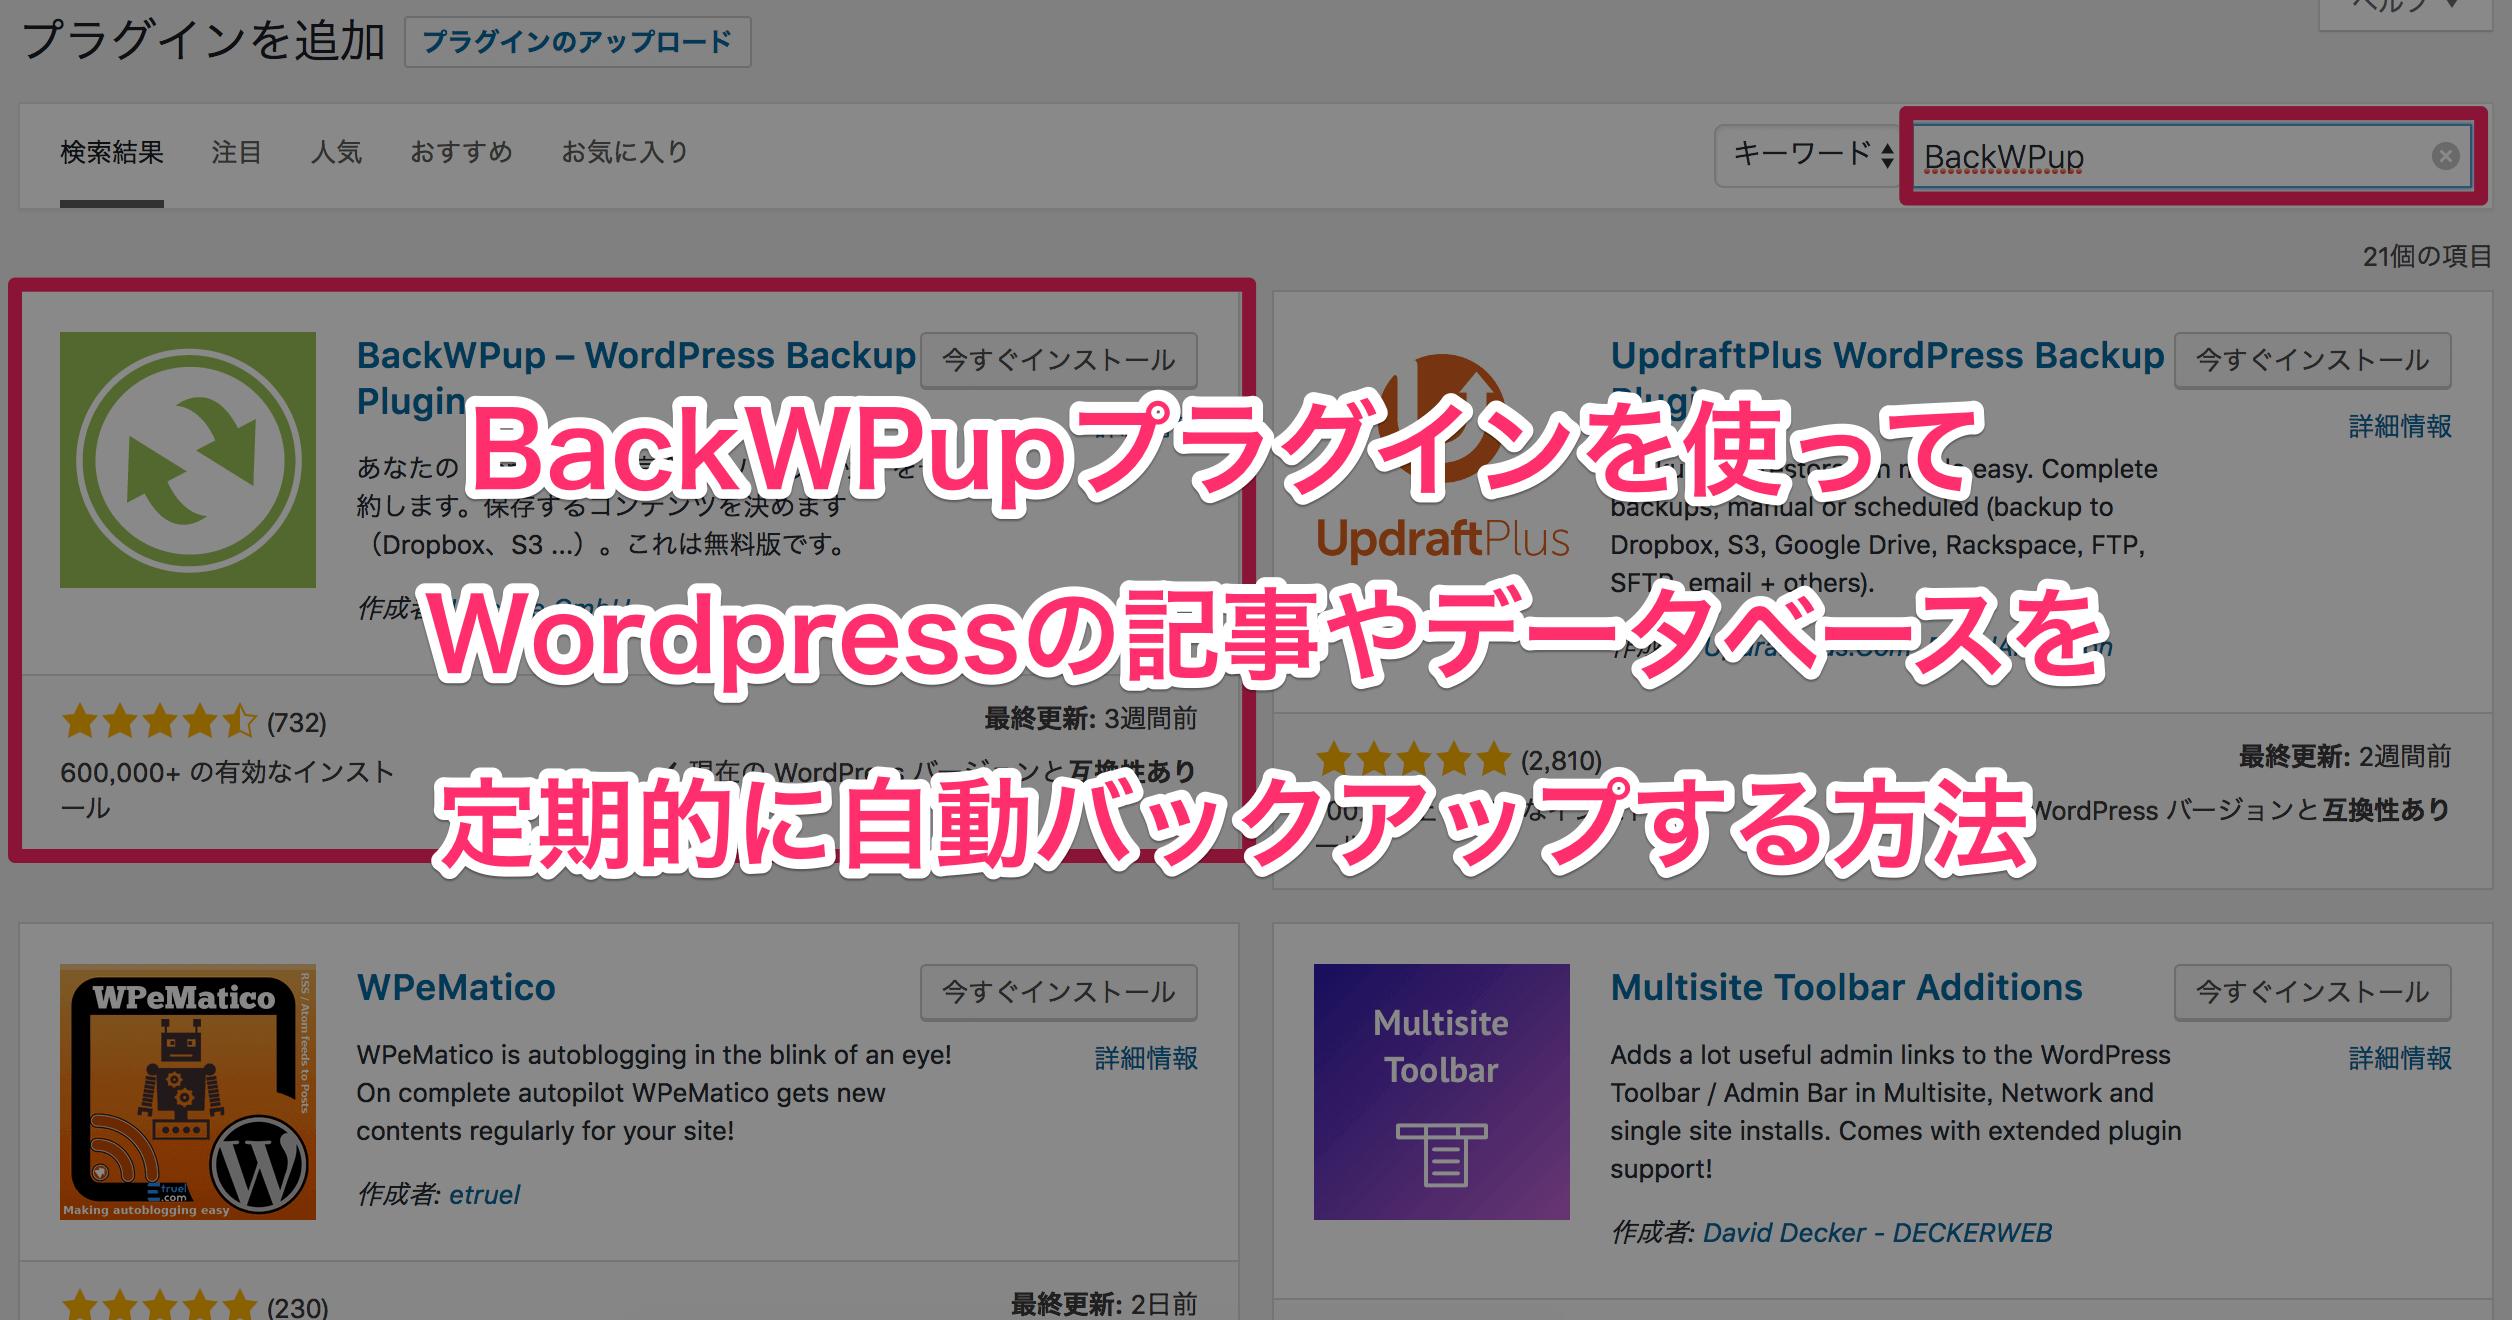 WordpressプラグインBackWPup